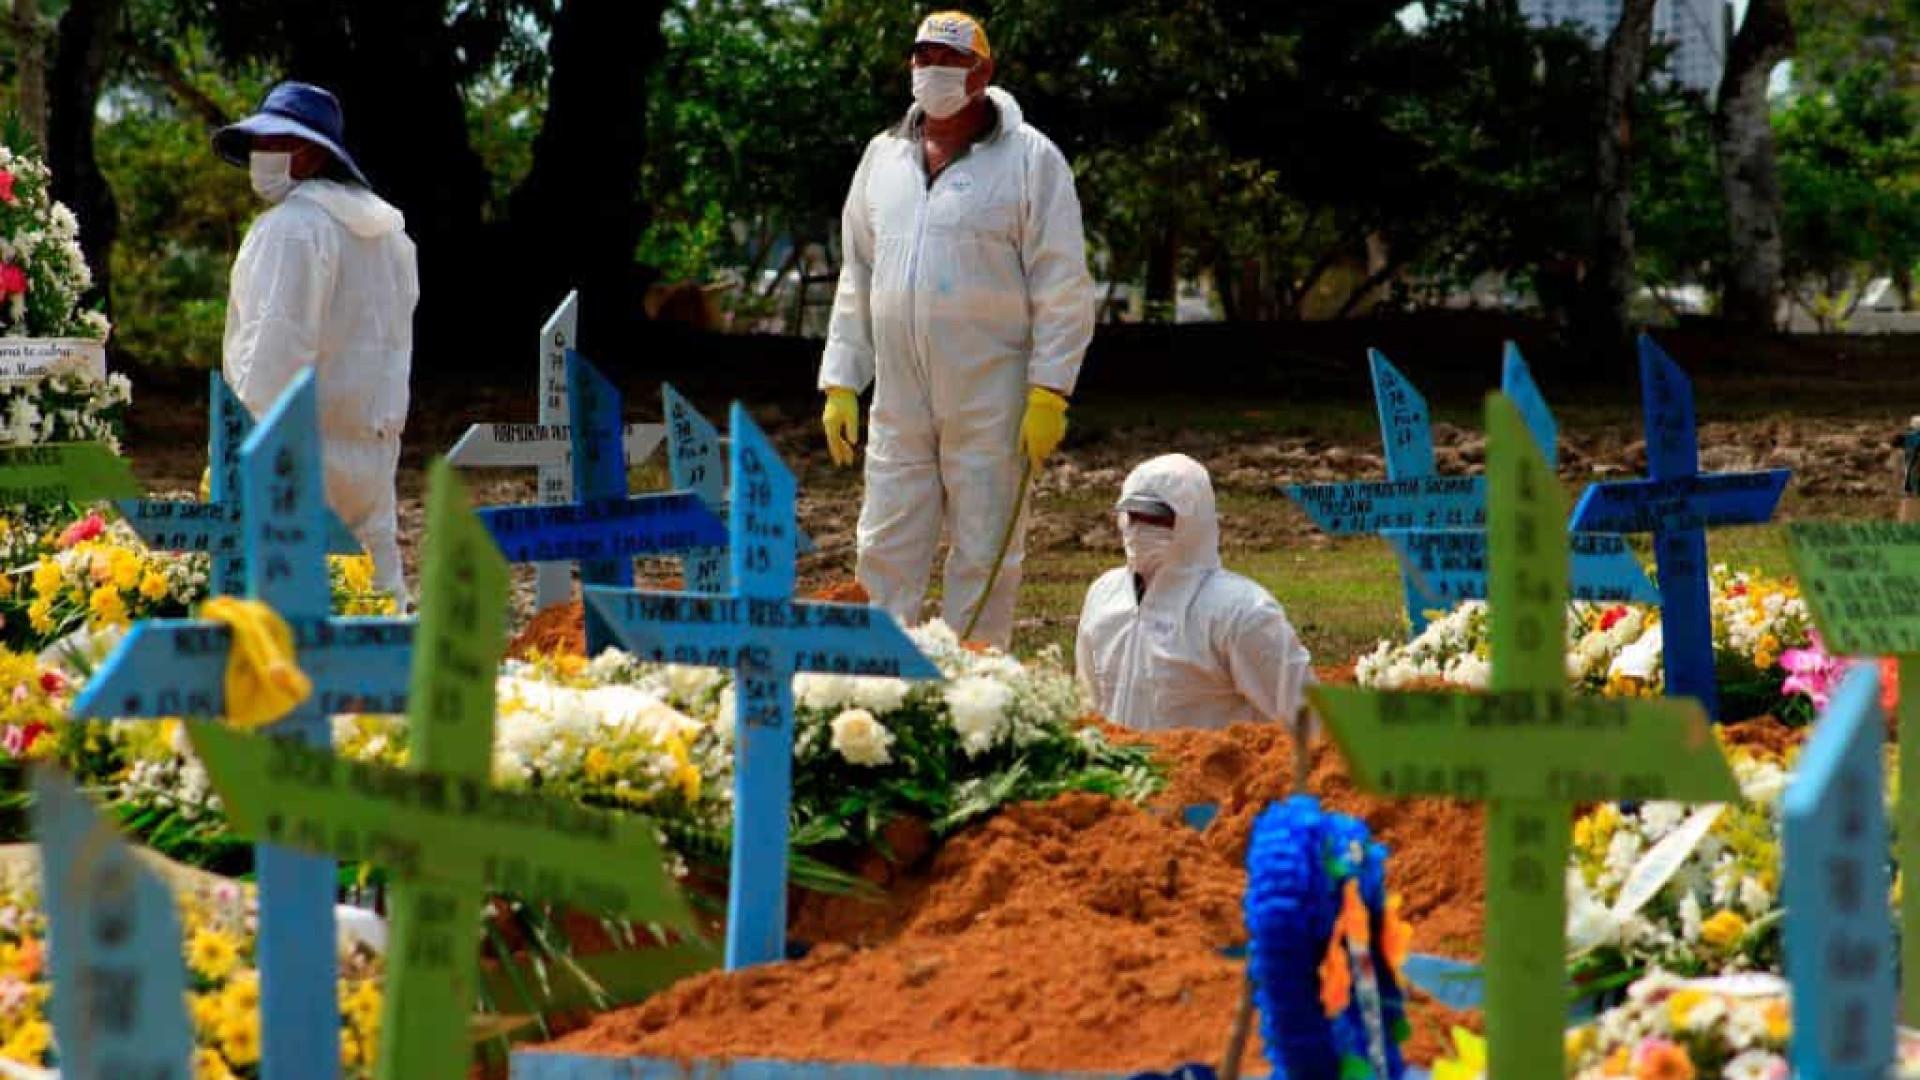 Brasil registra média de 1.849 mortes por covid-19; total passa de 462,9 mil